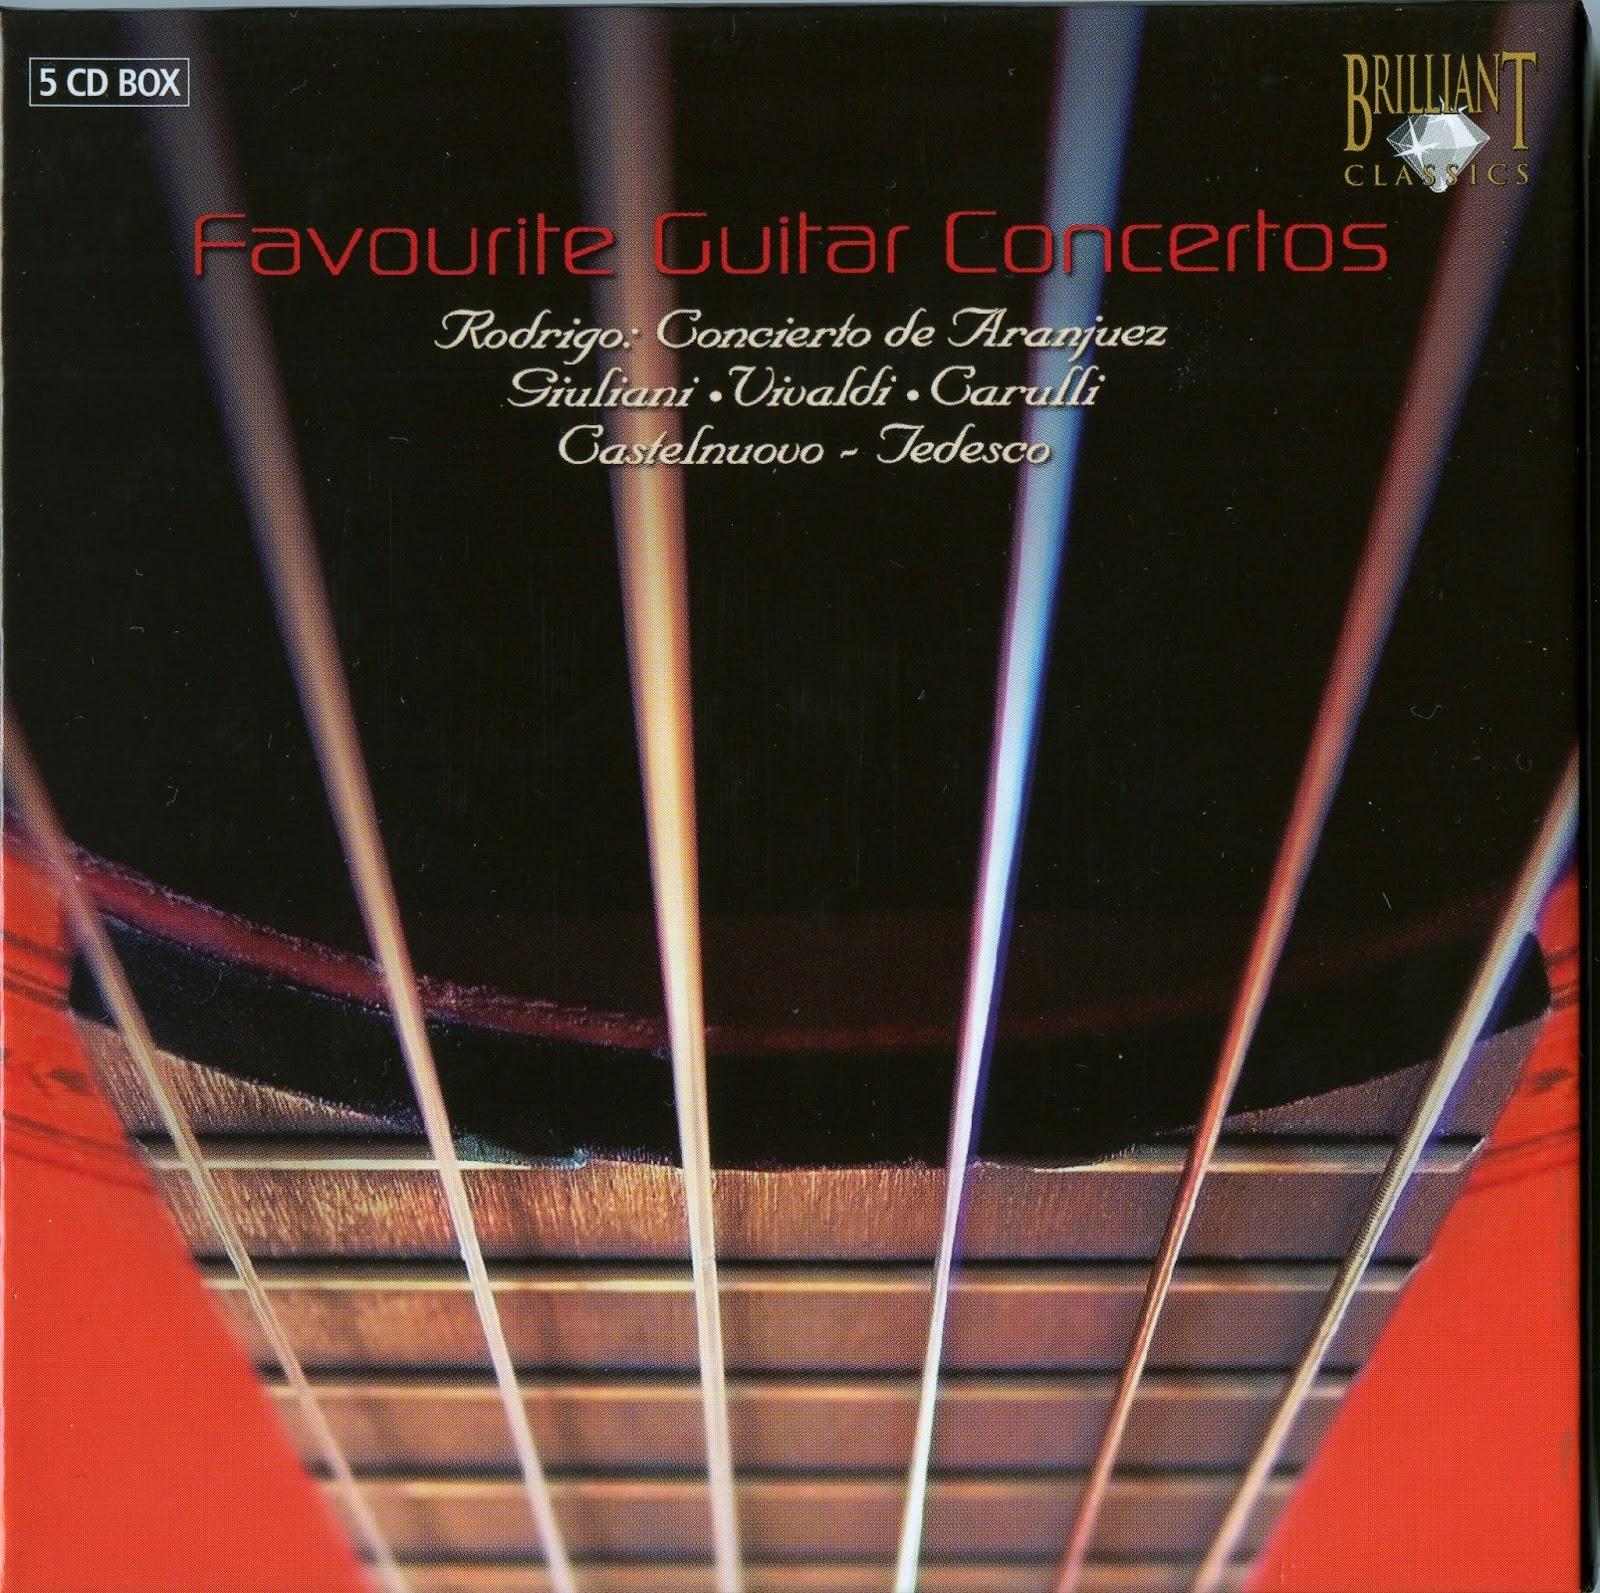 Diabolus In Musica: Favourite Guitar Concertos - Box Set 5CDs